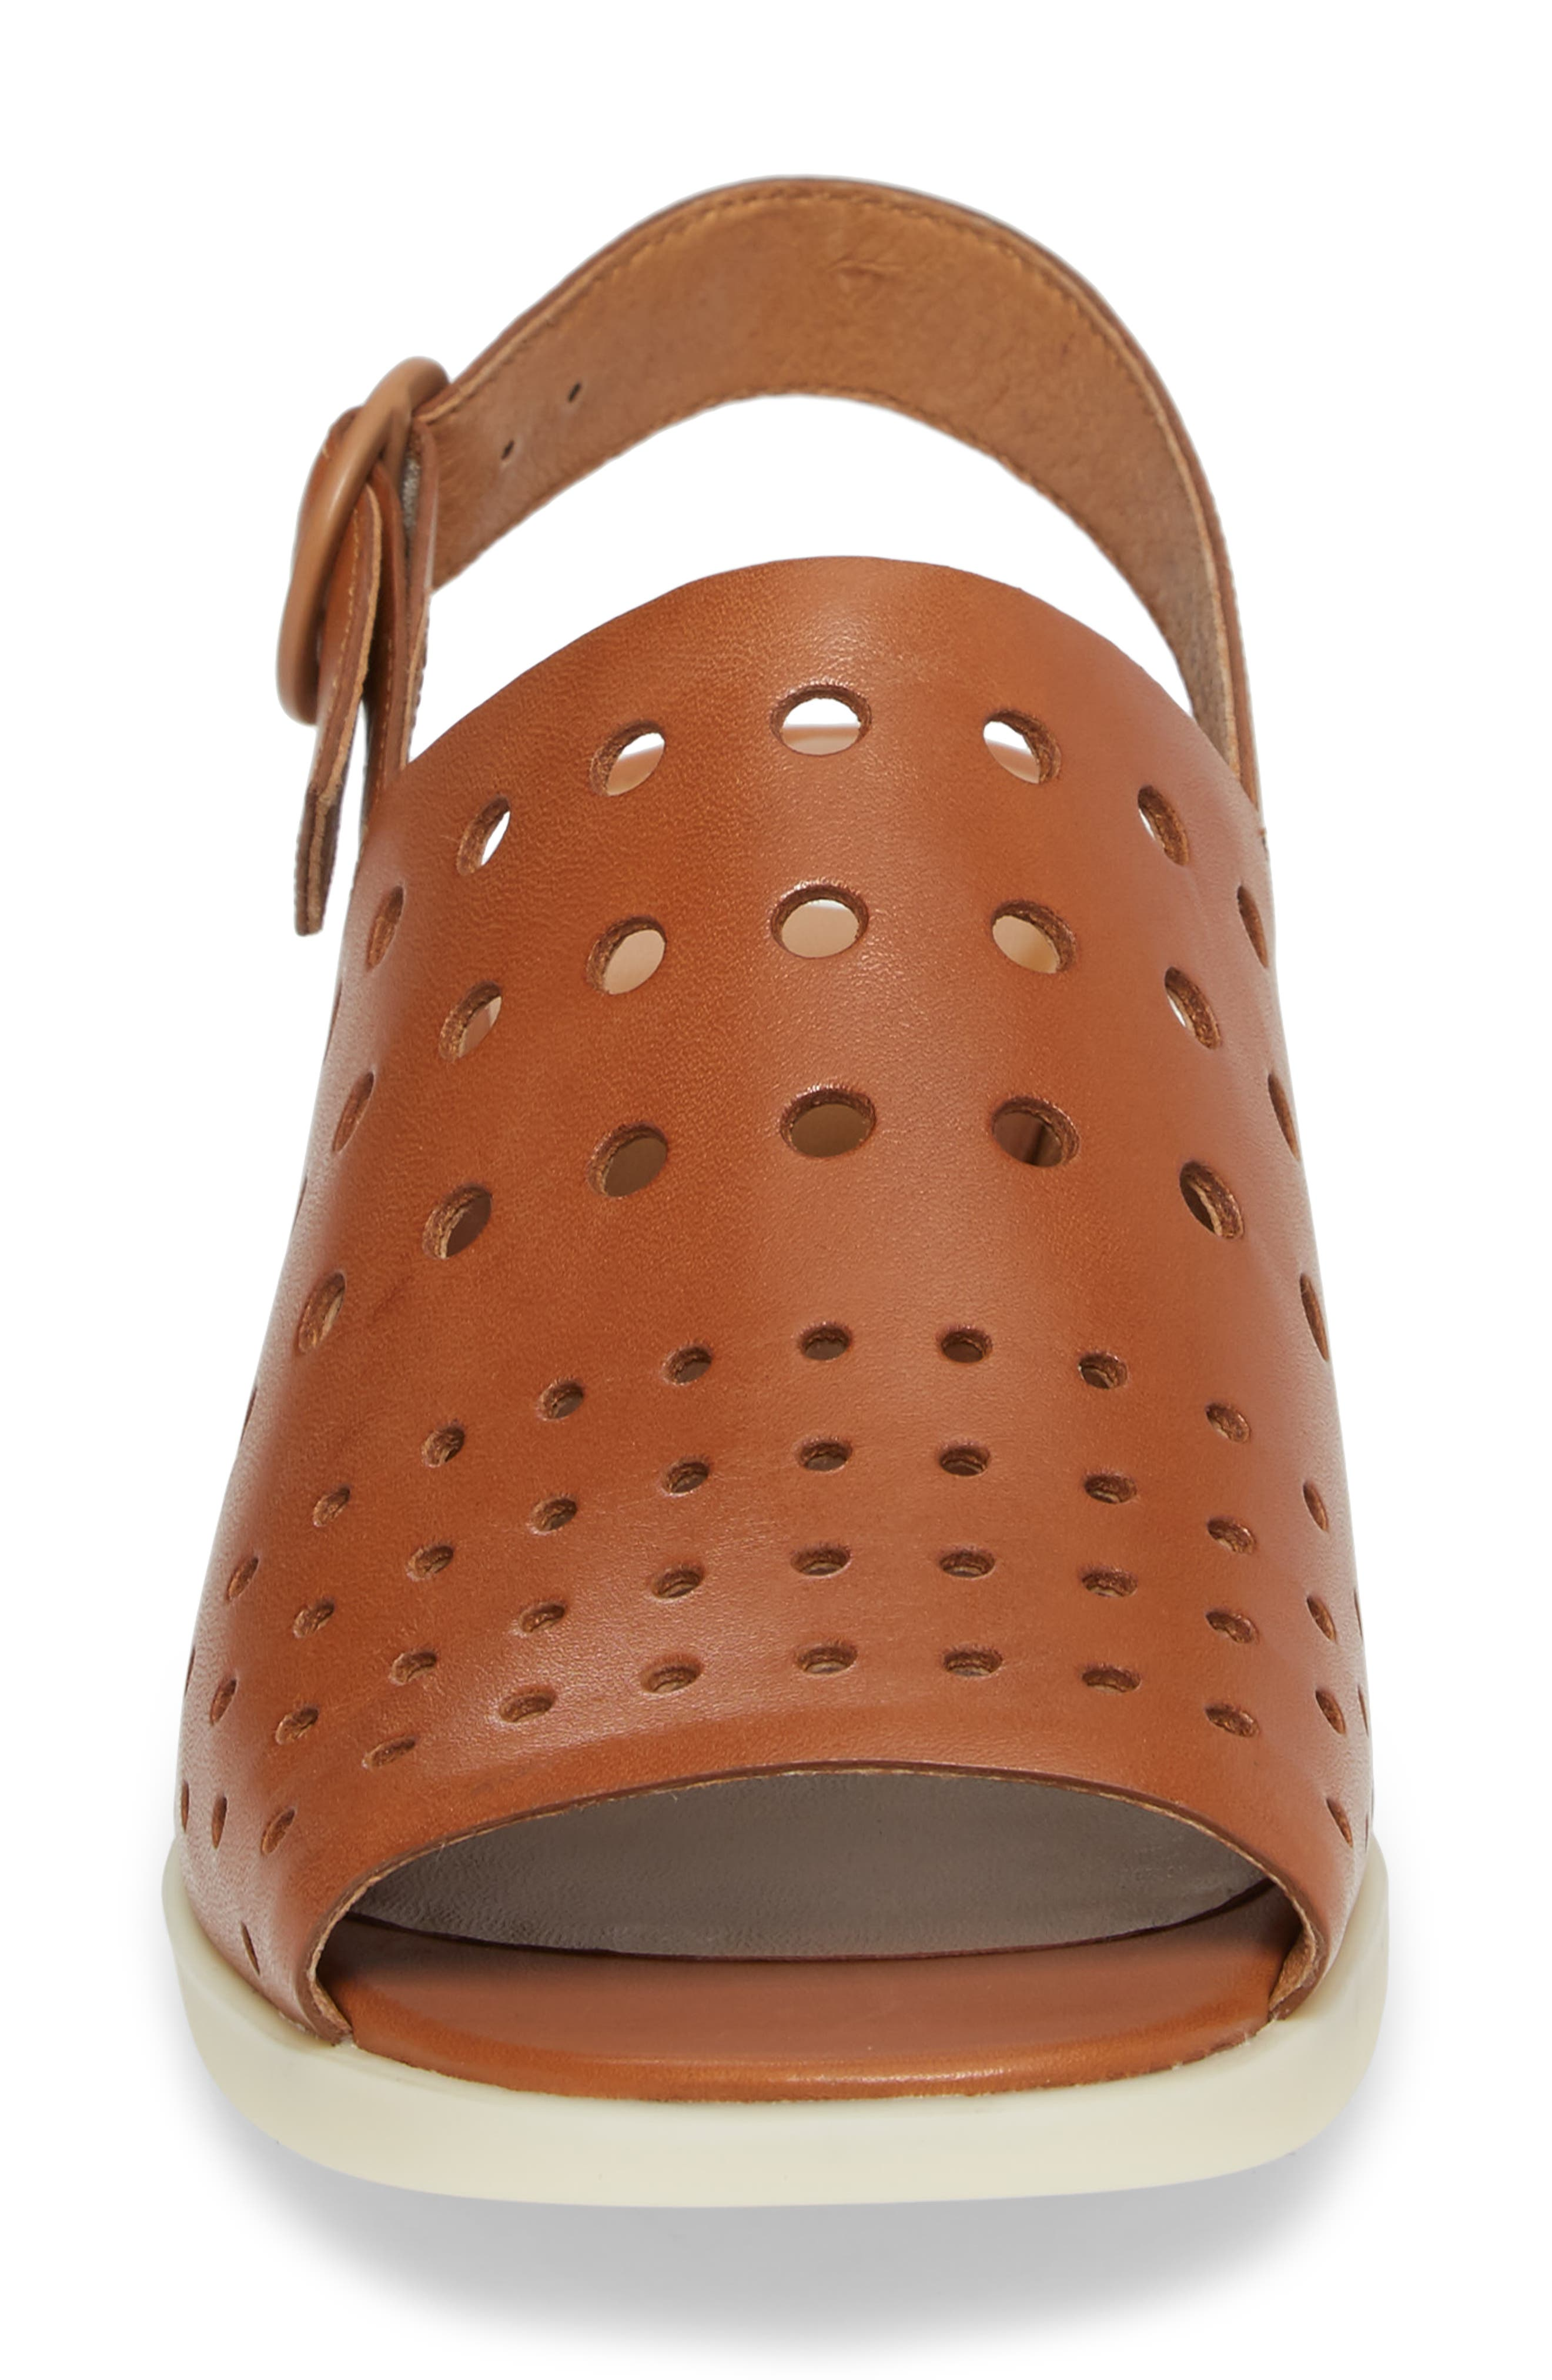 Twins Sandal,                             Alternate thumbnail 4, color,                             Rust/ Copper Leather